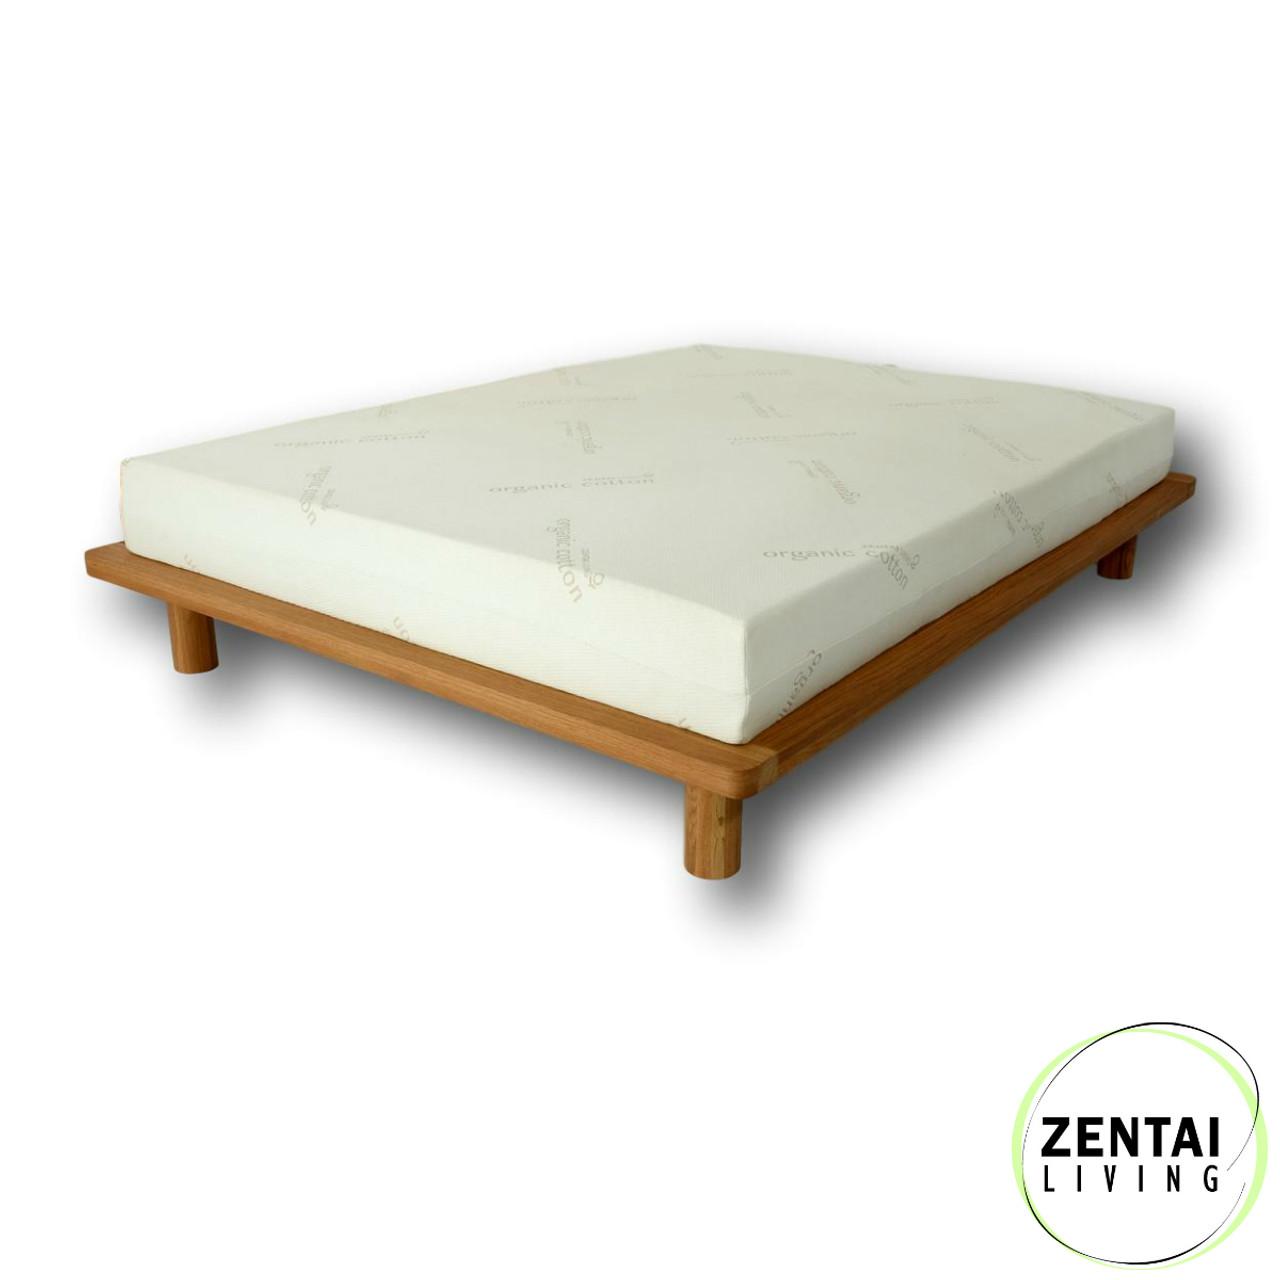 Platform - Solid Wood Bed Frame in American Oak | Zentai Living